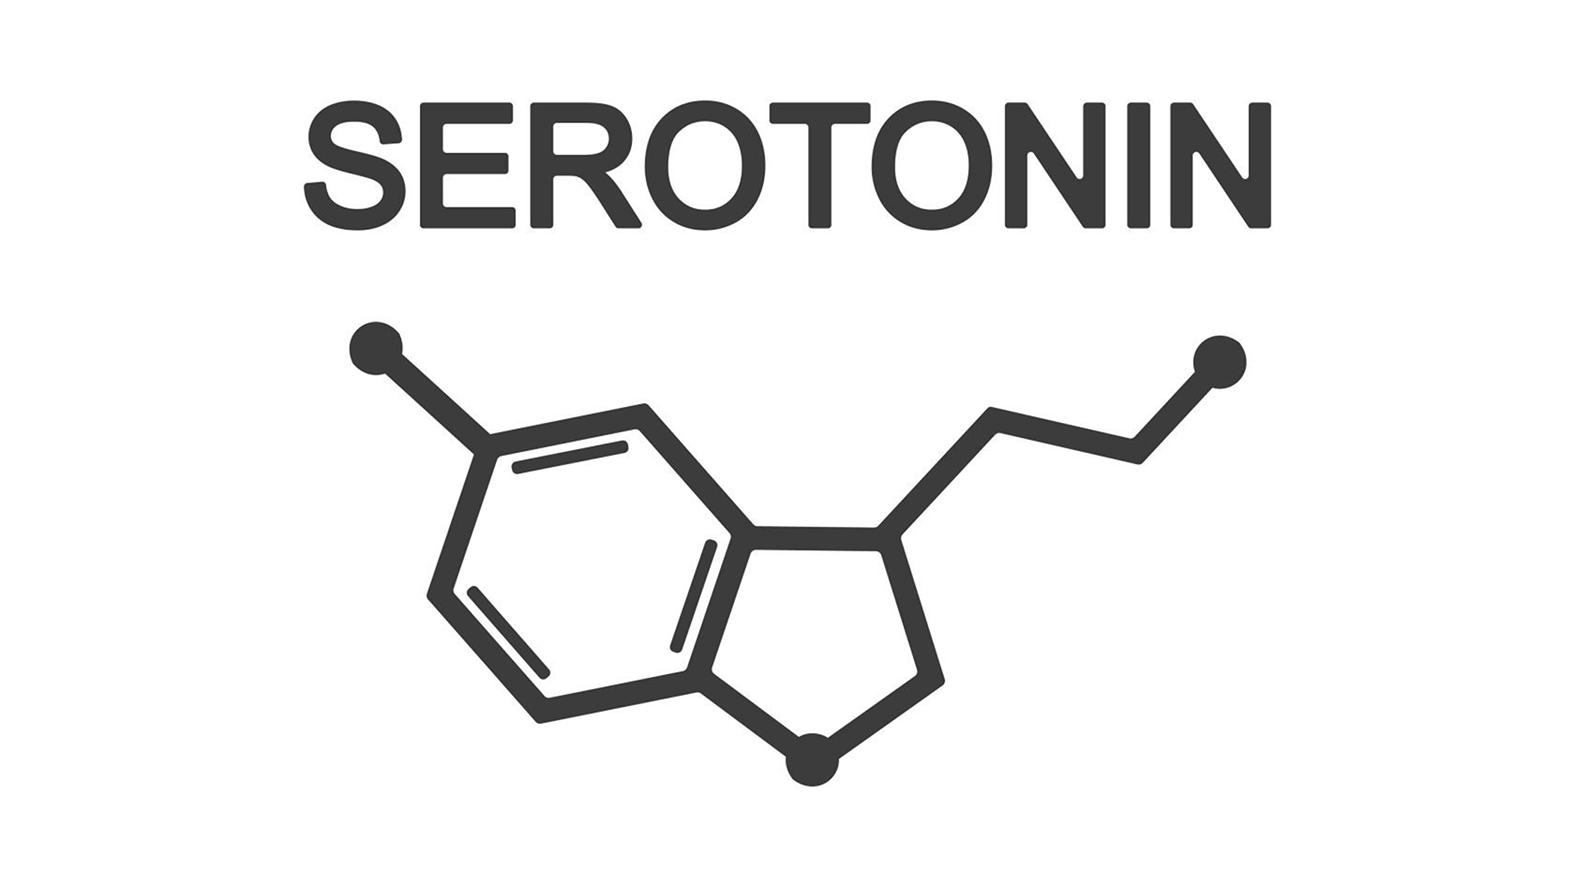 Serotonin and Substance